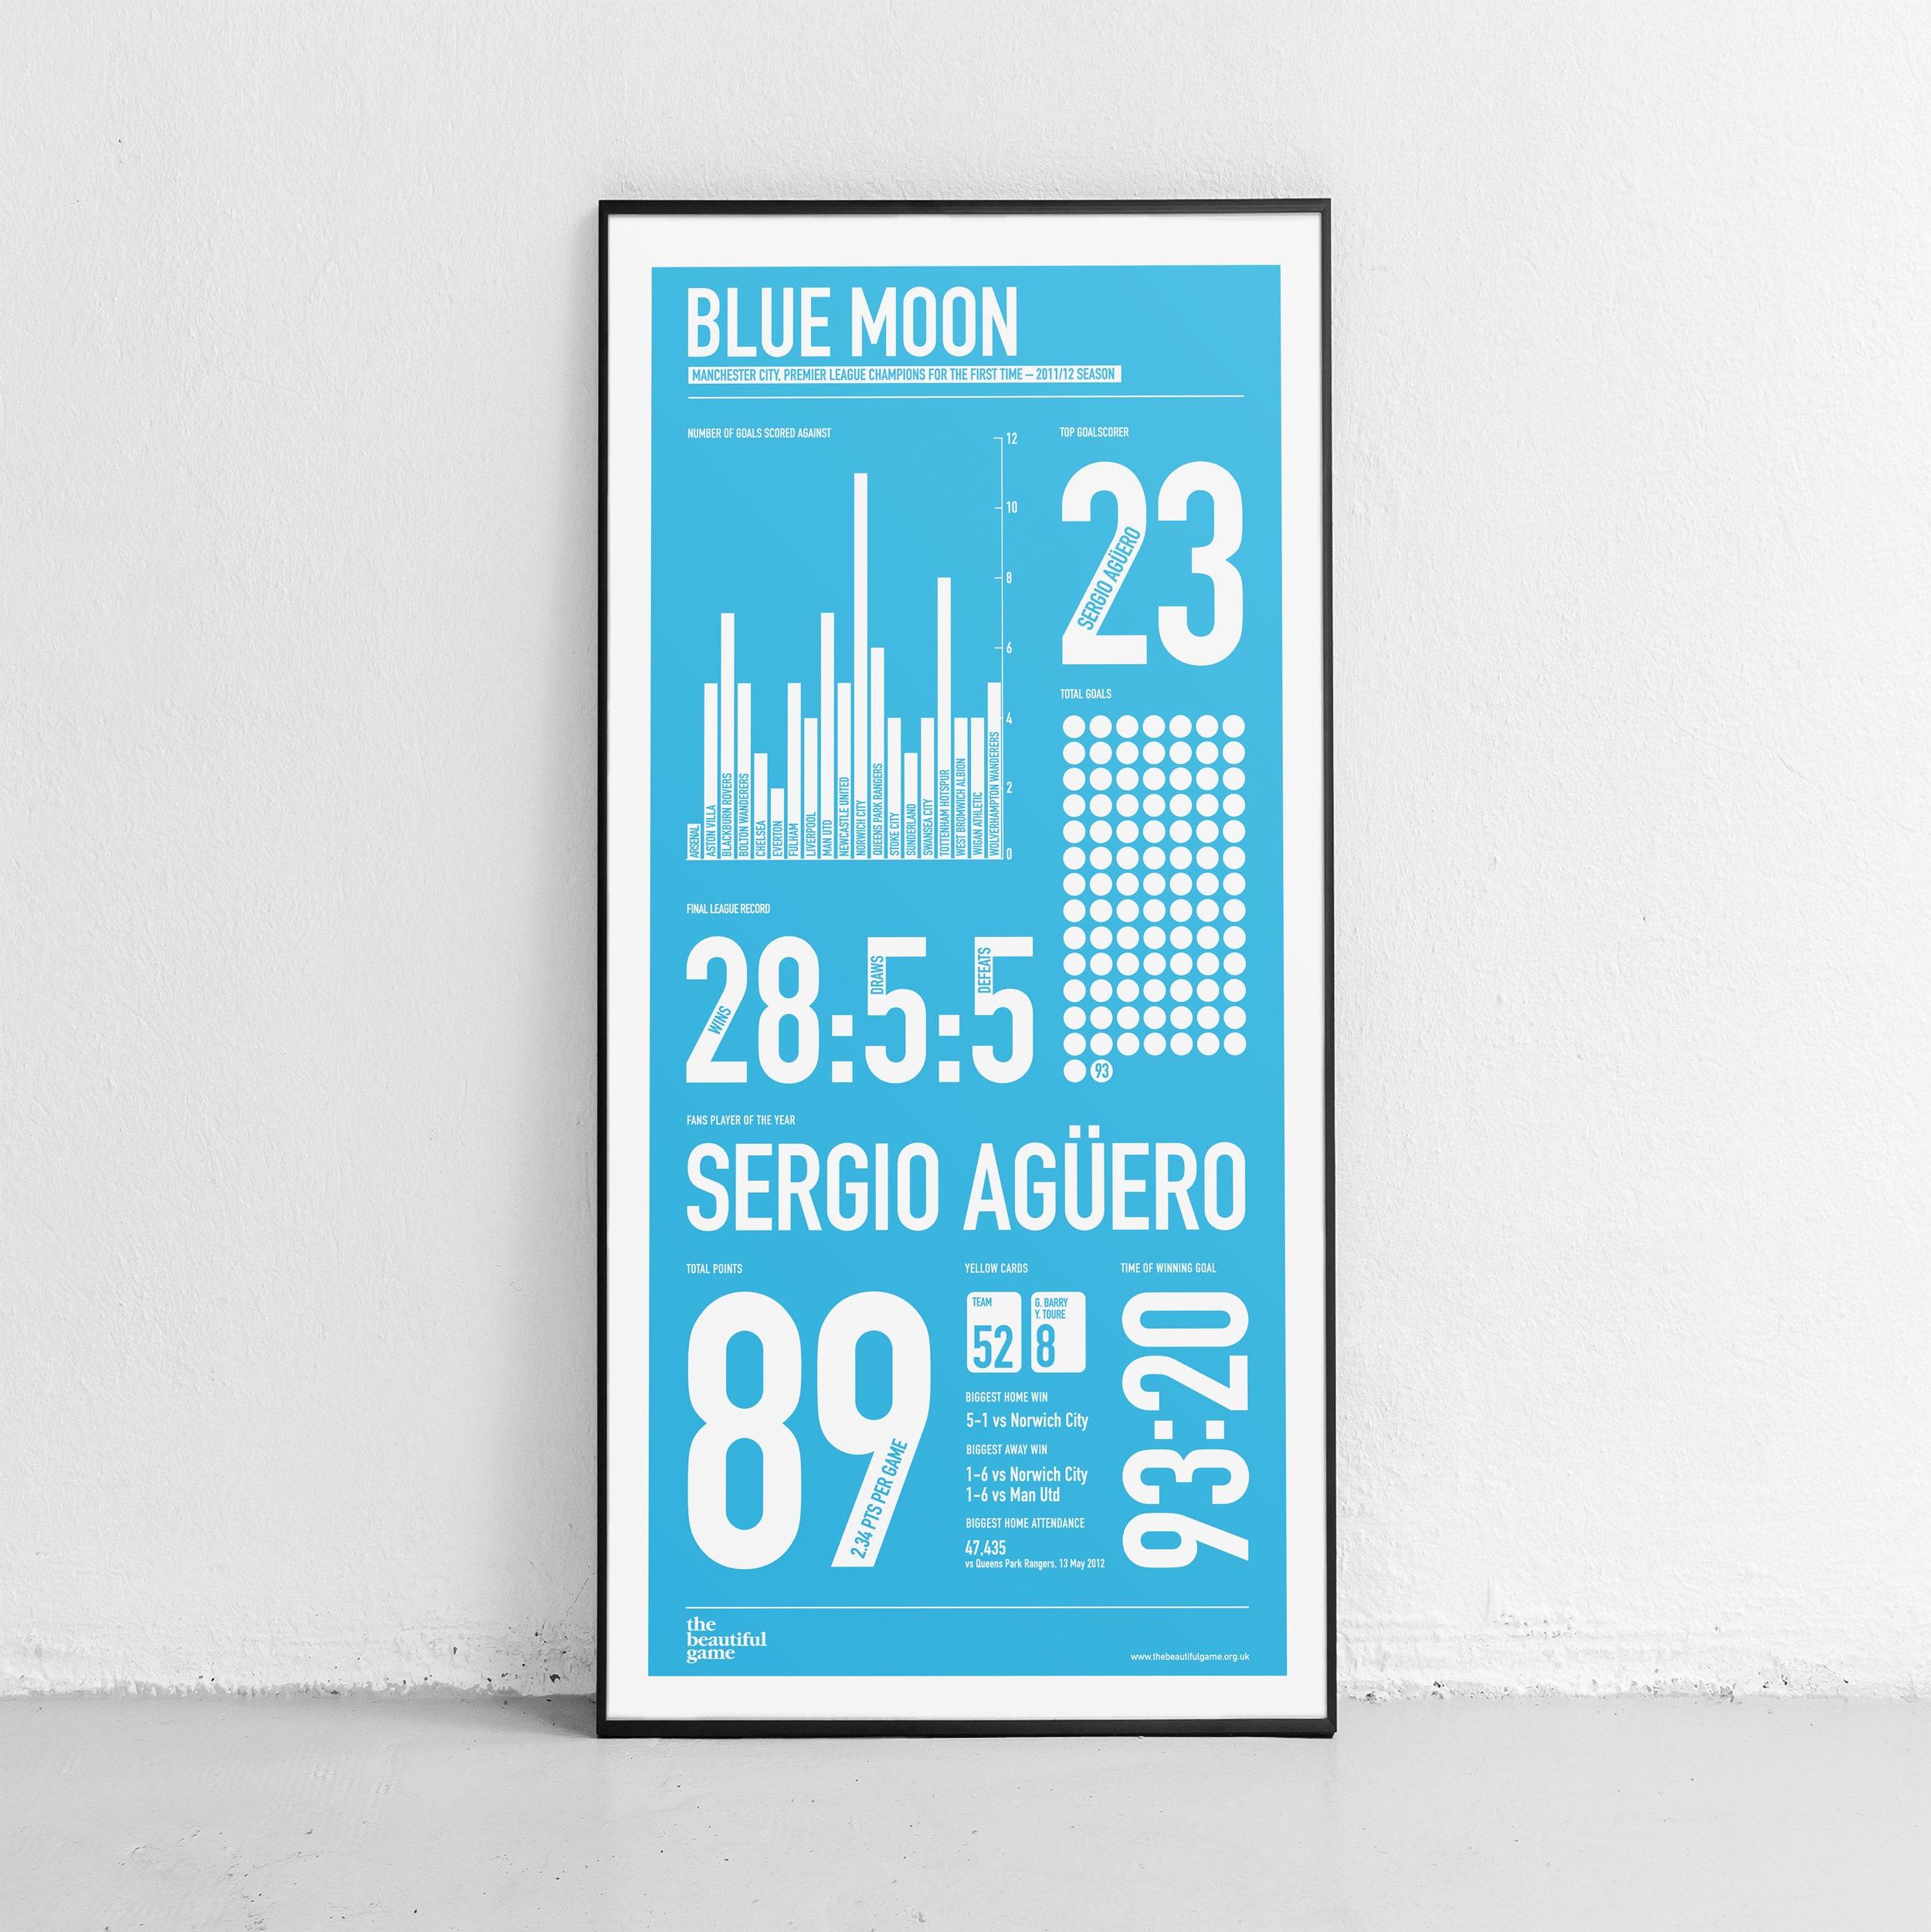 Manchester City: Blue Moon screen print